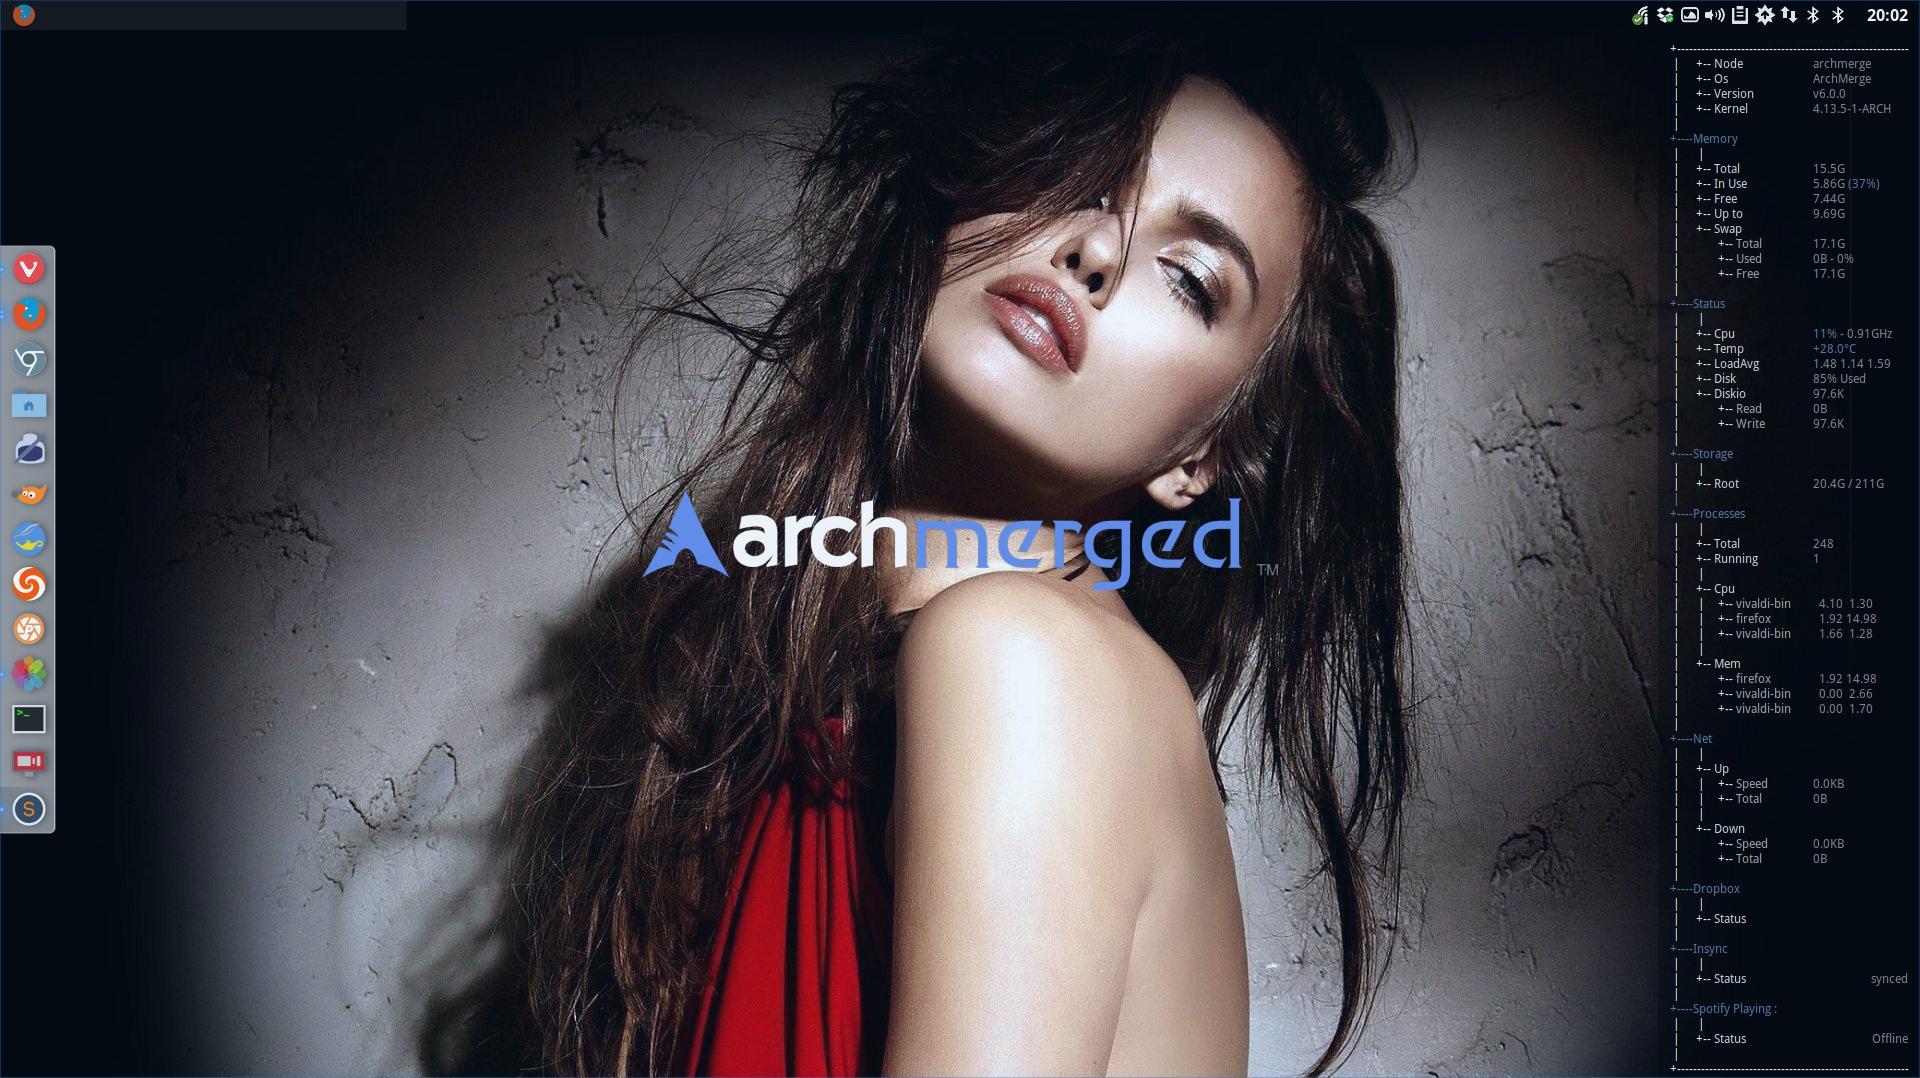 ArchMergeD Kirk Release 6.1